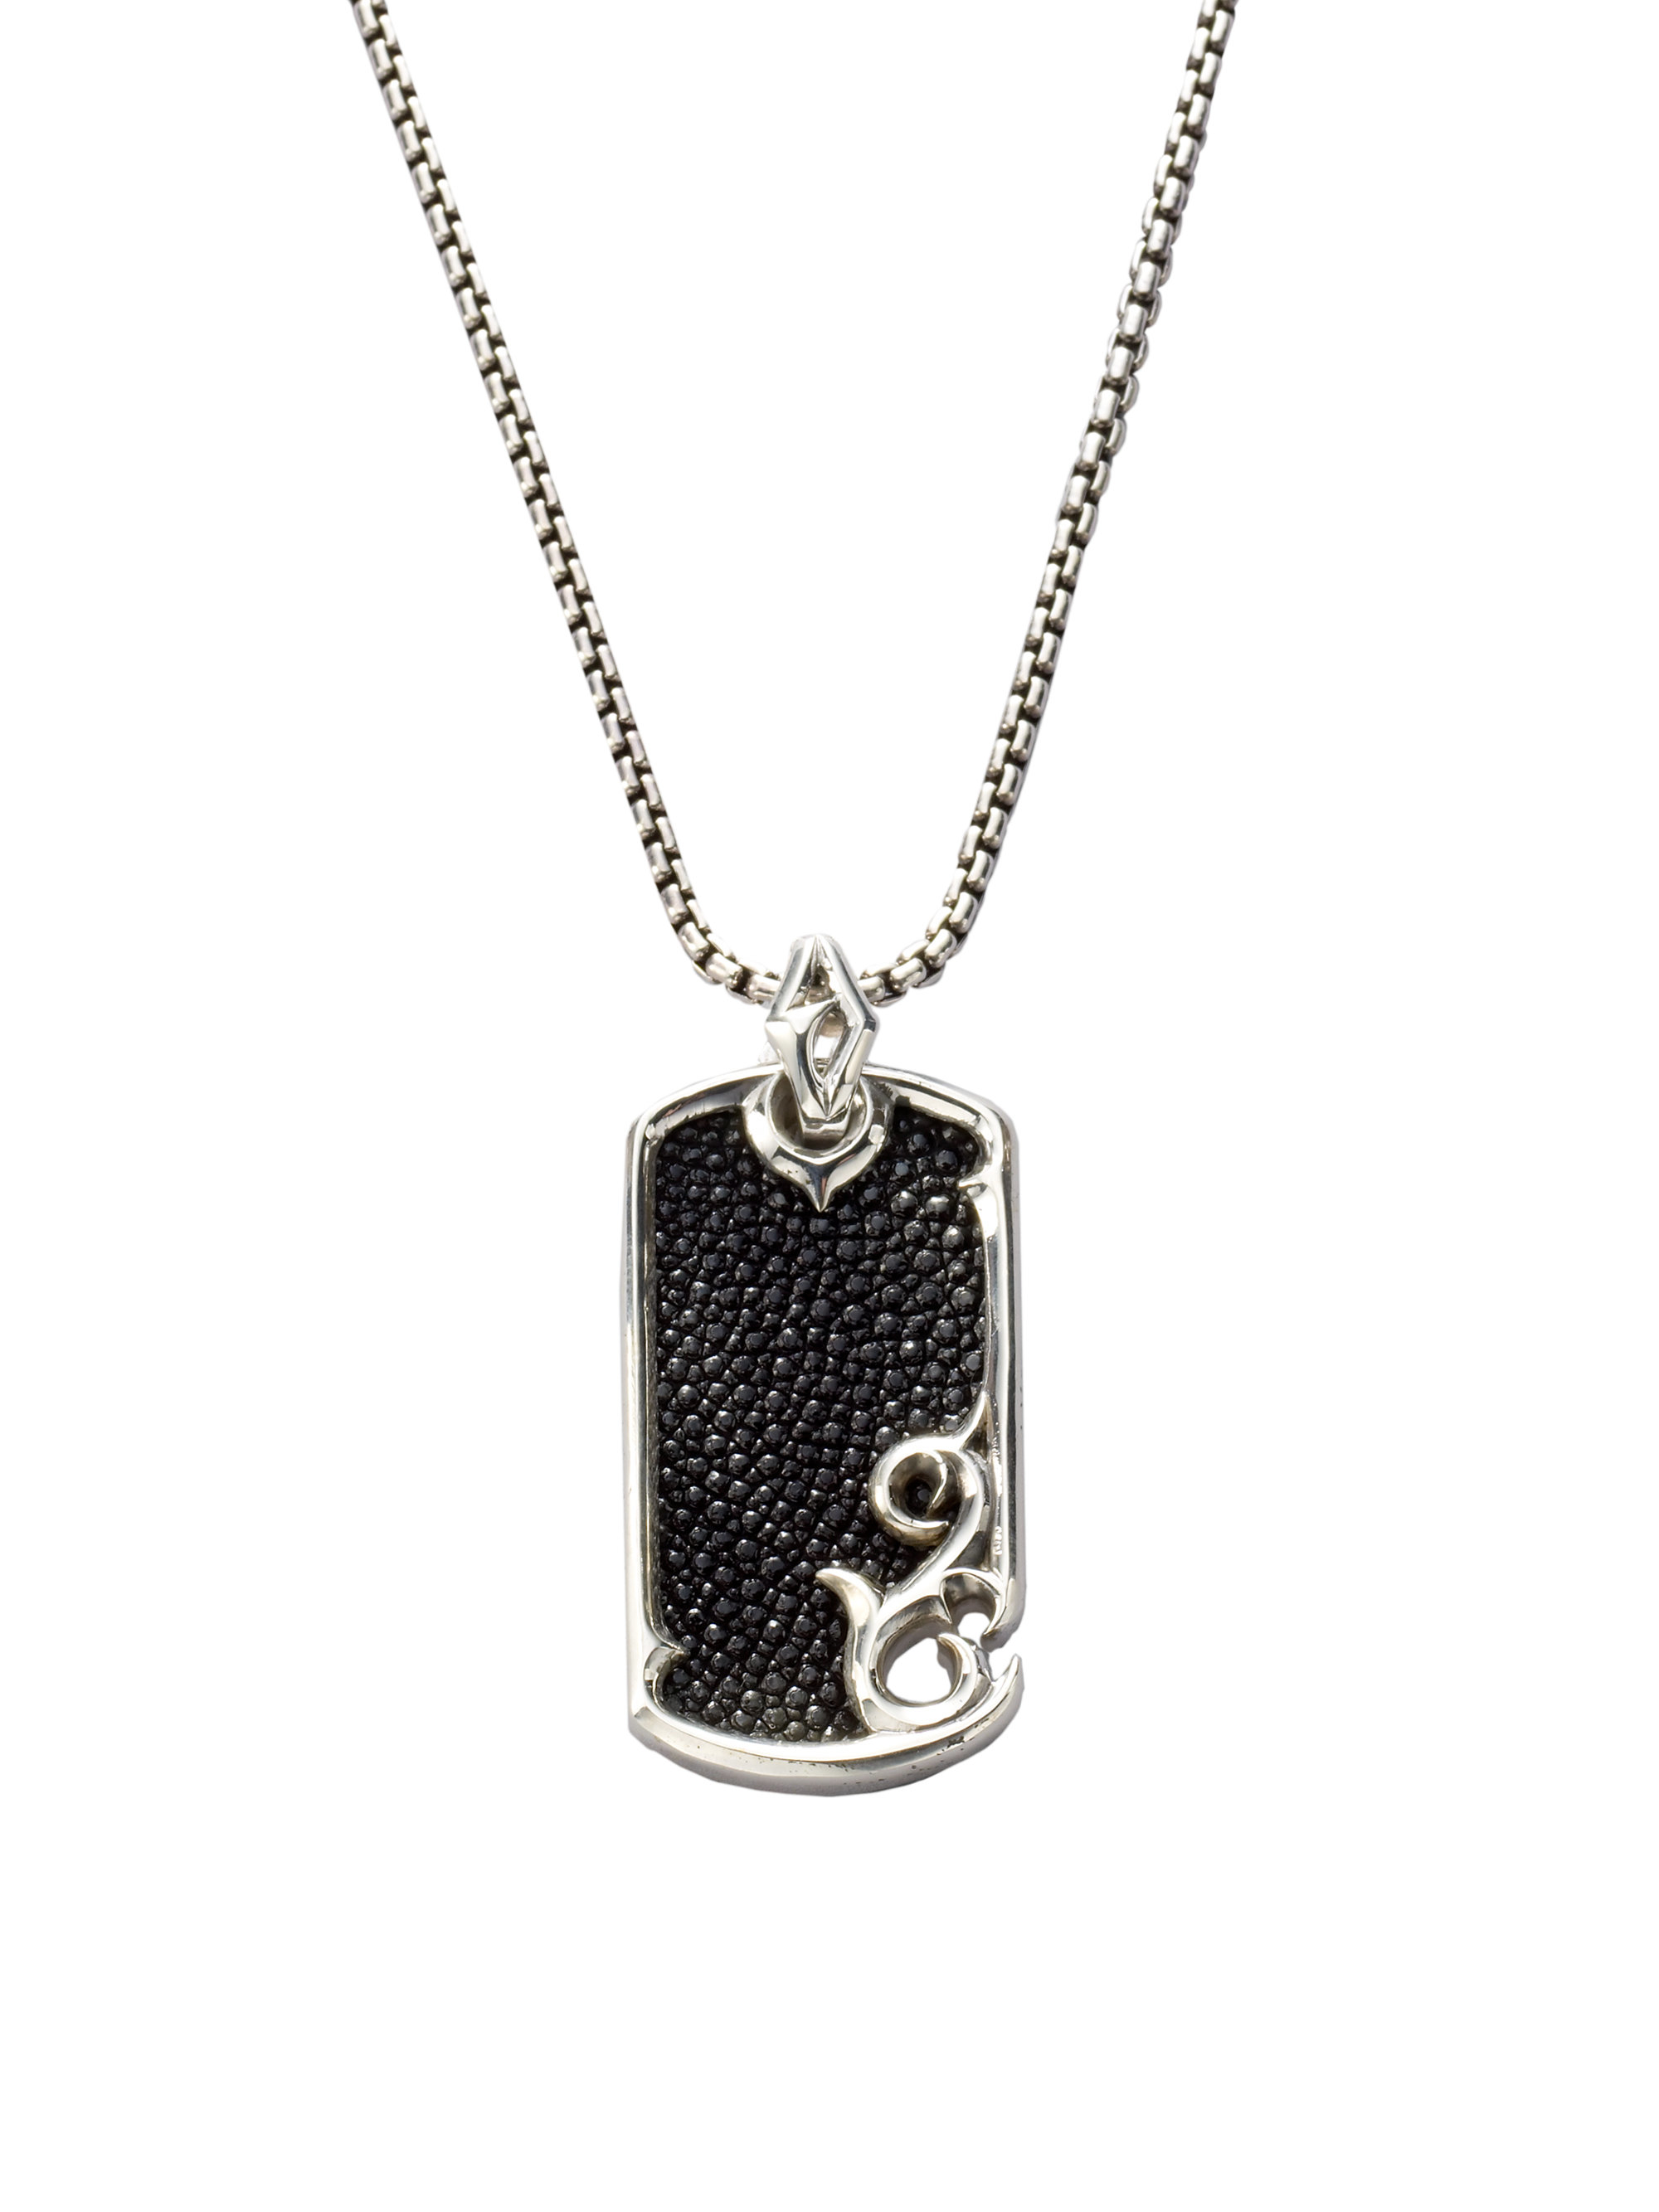 Stephen Webster Leather Silver Dogtag Necklace In Black